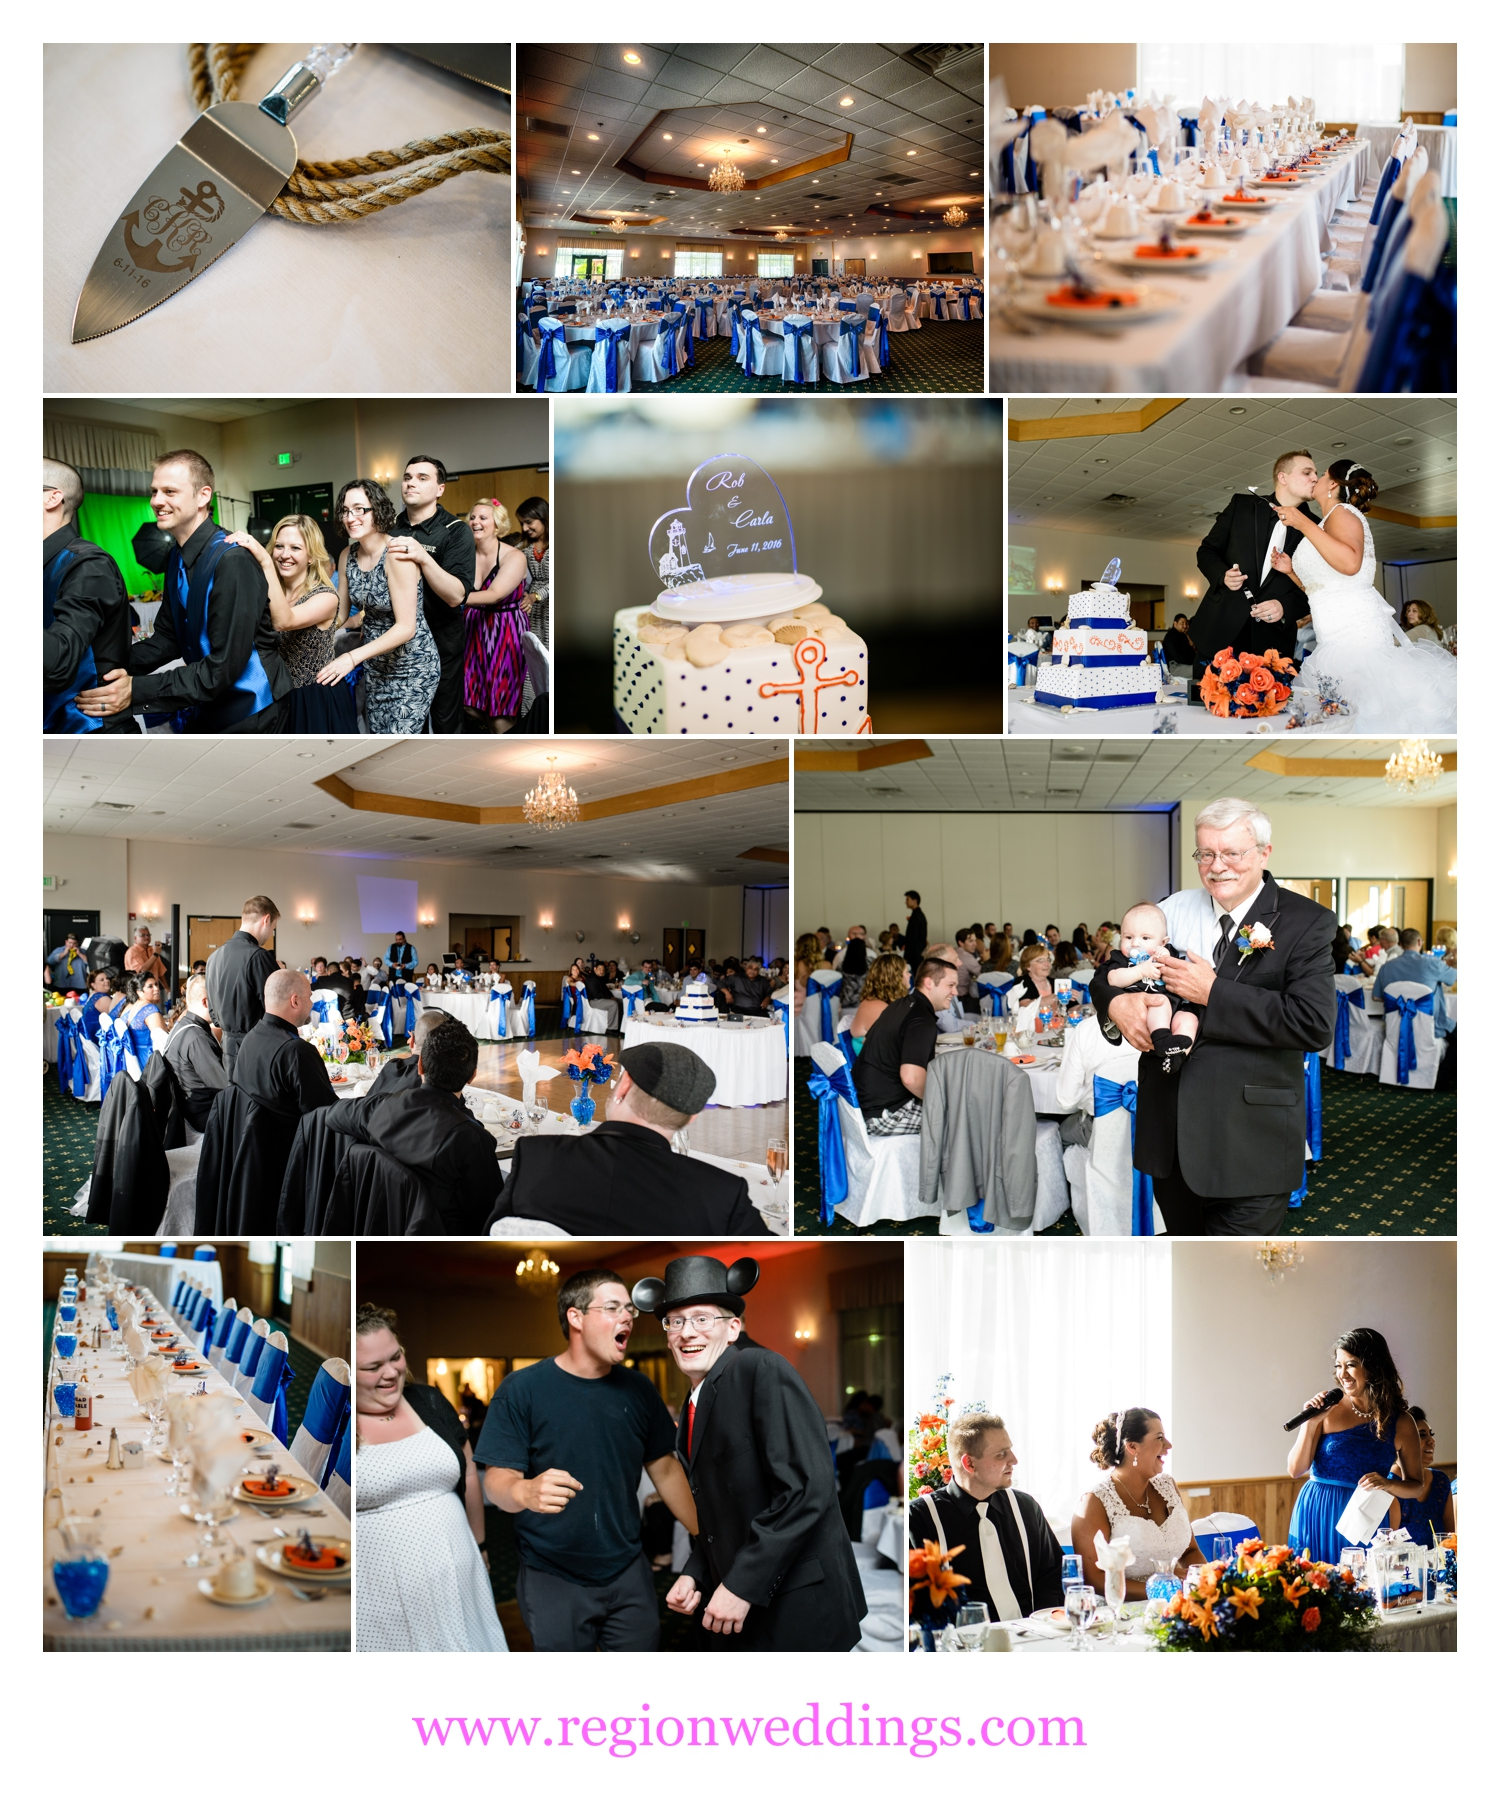 Summer wedding reception at The Patrician Banquet Hall.